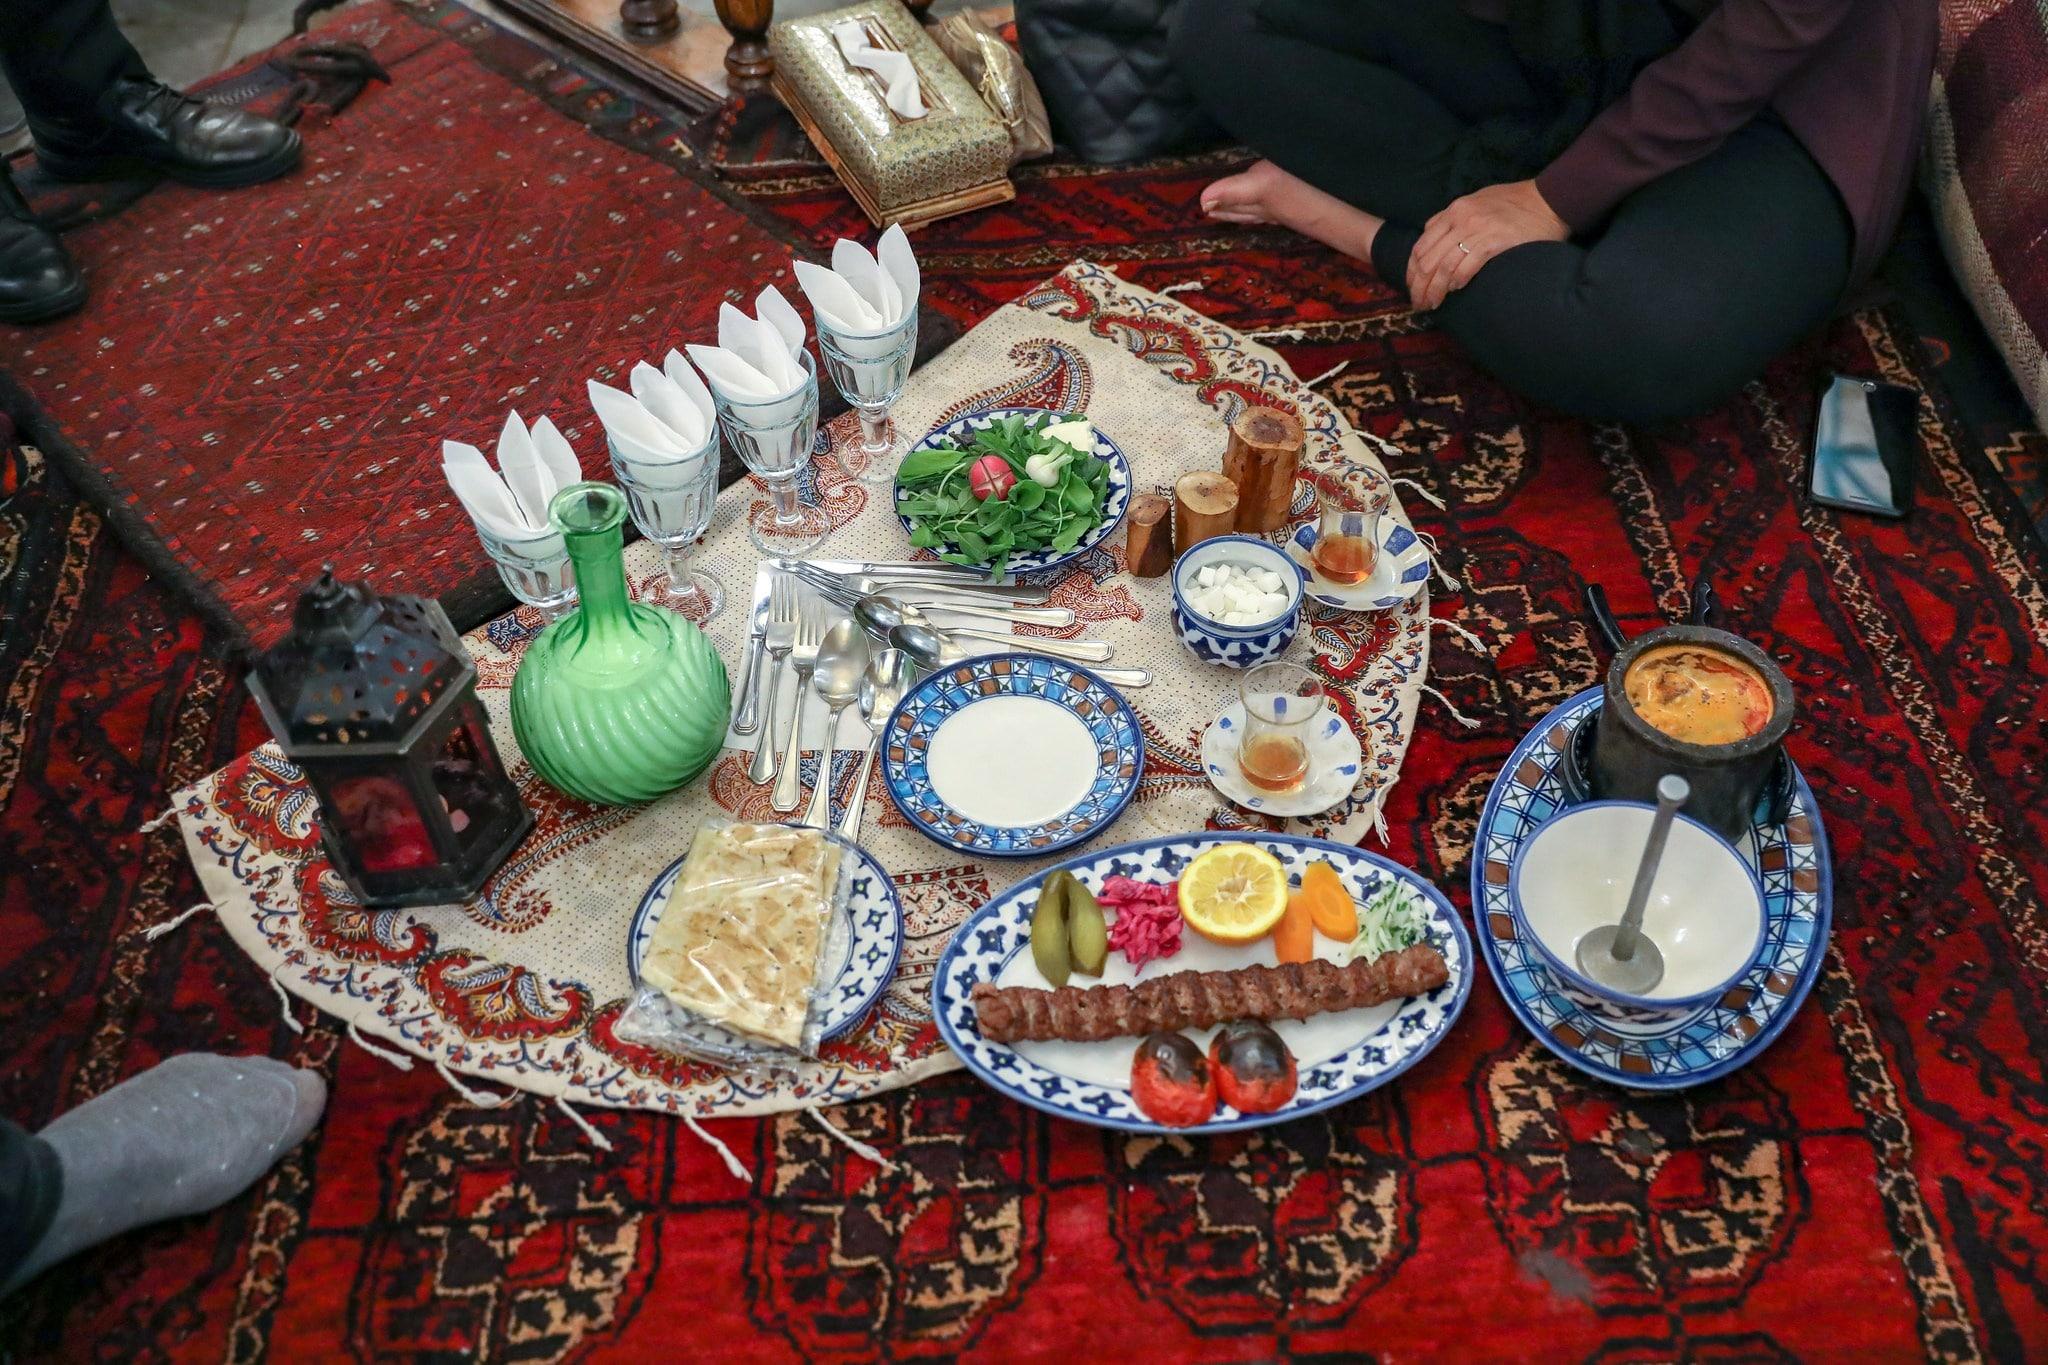 Dinner set up in Iran